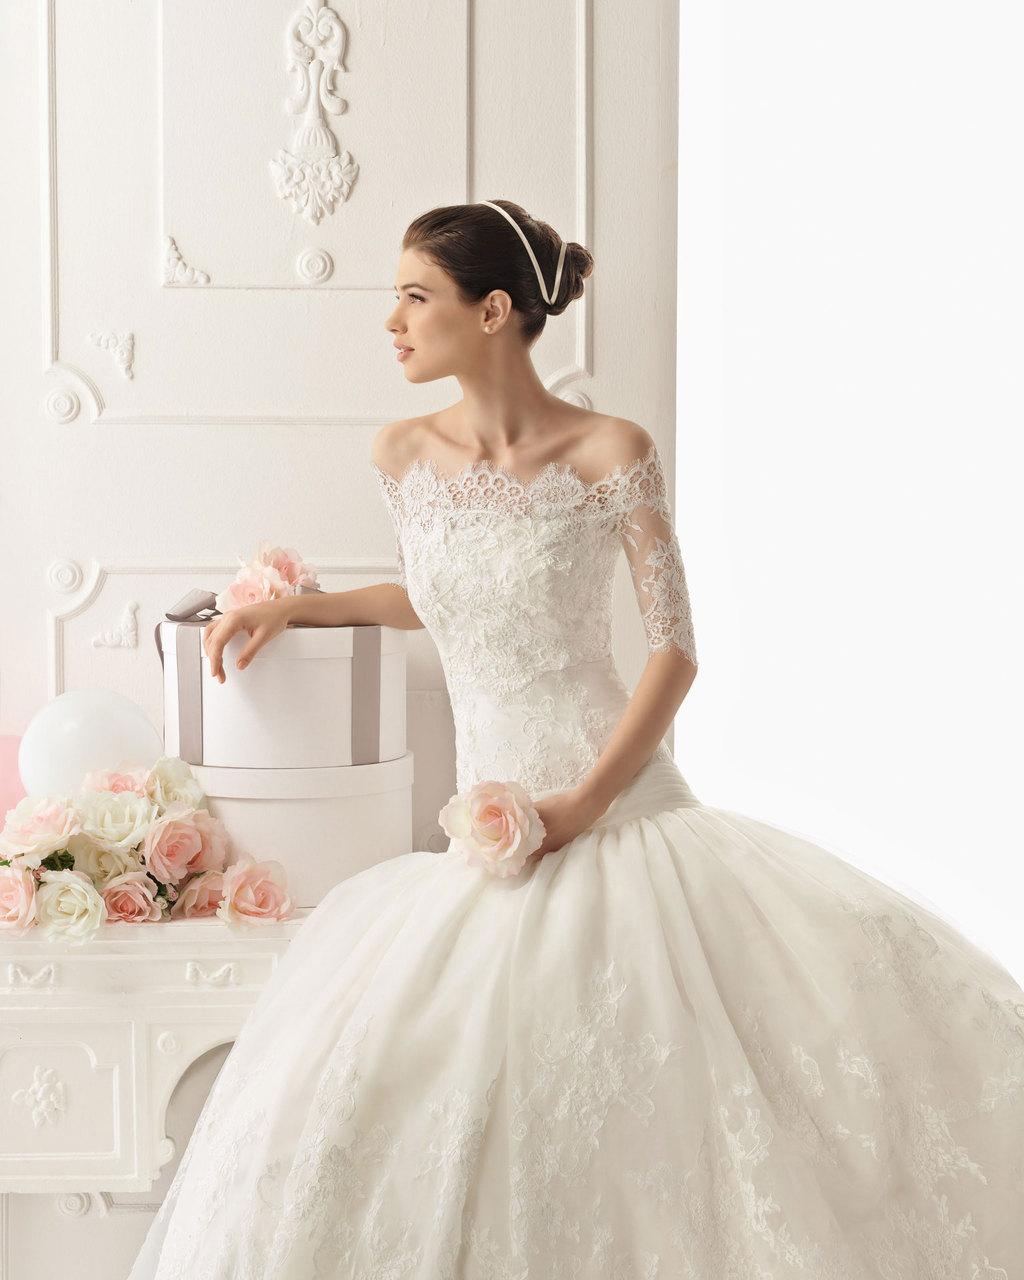 Romantic-lace-wedding-dress-rosa-clara-bridal-gown-2013-1.full